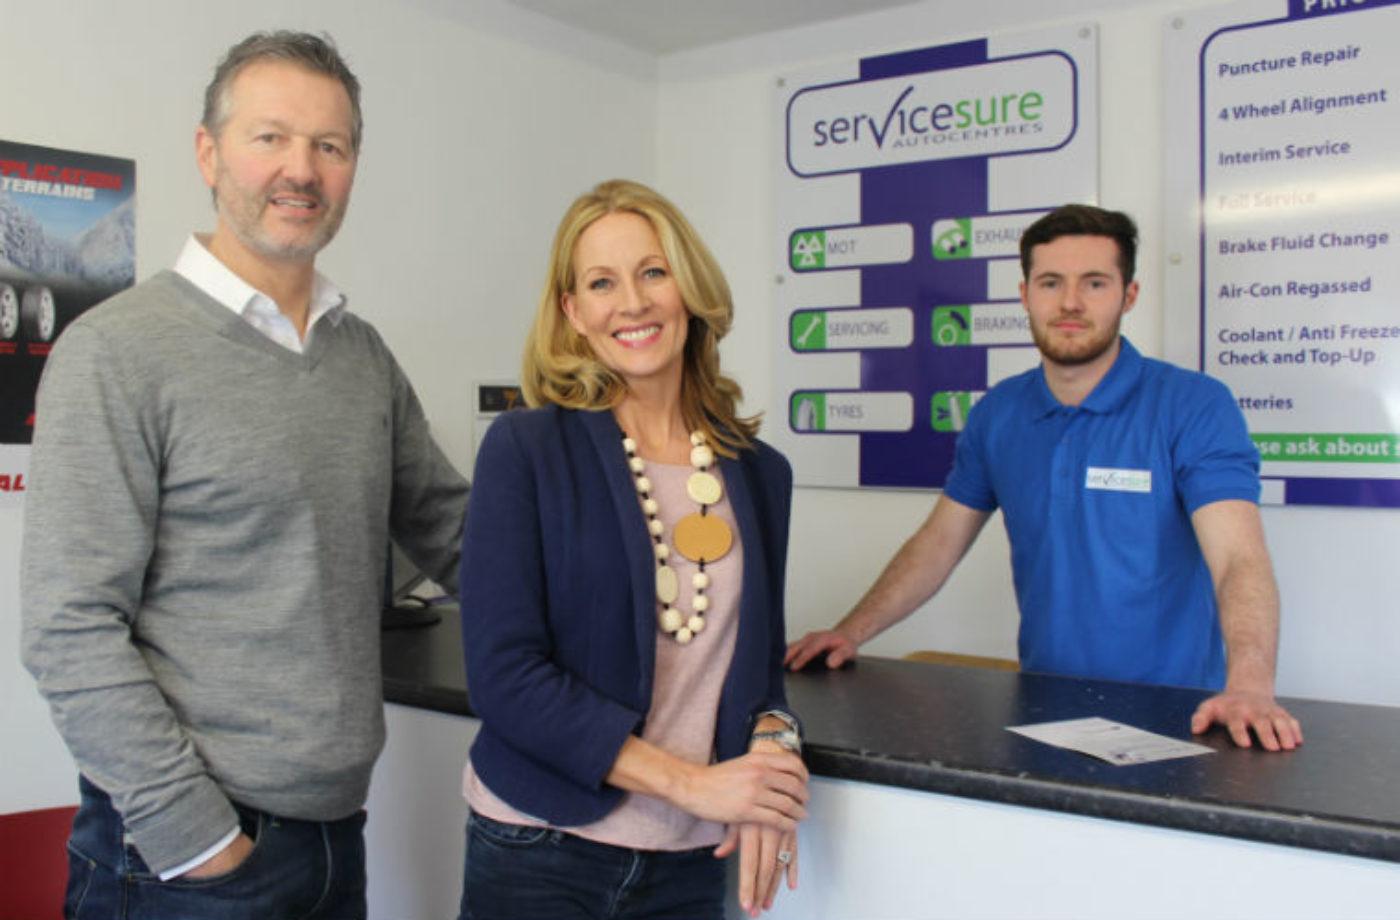 Confederation of British Surgery members receive ten per cent Servicesure discount